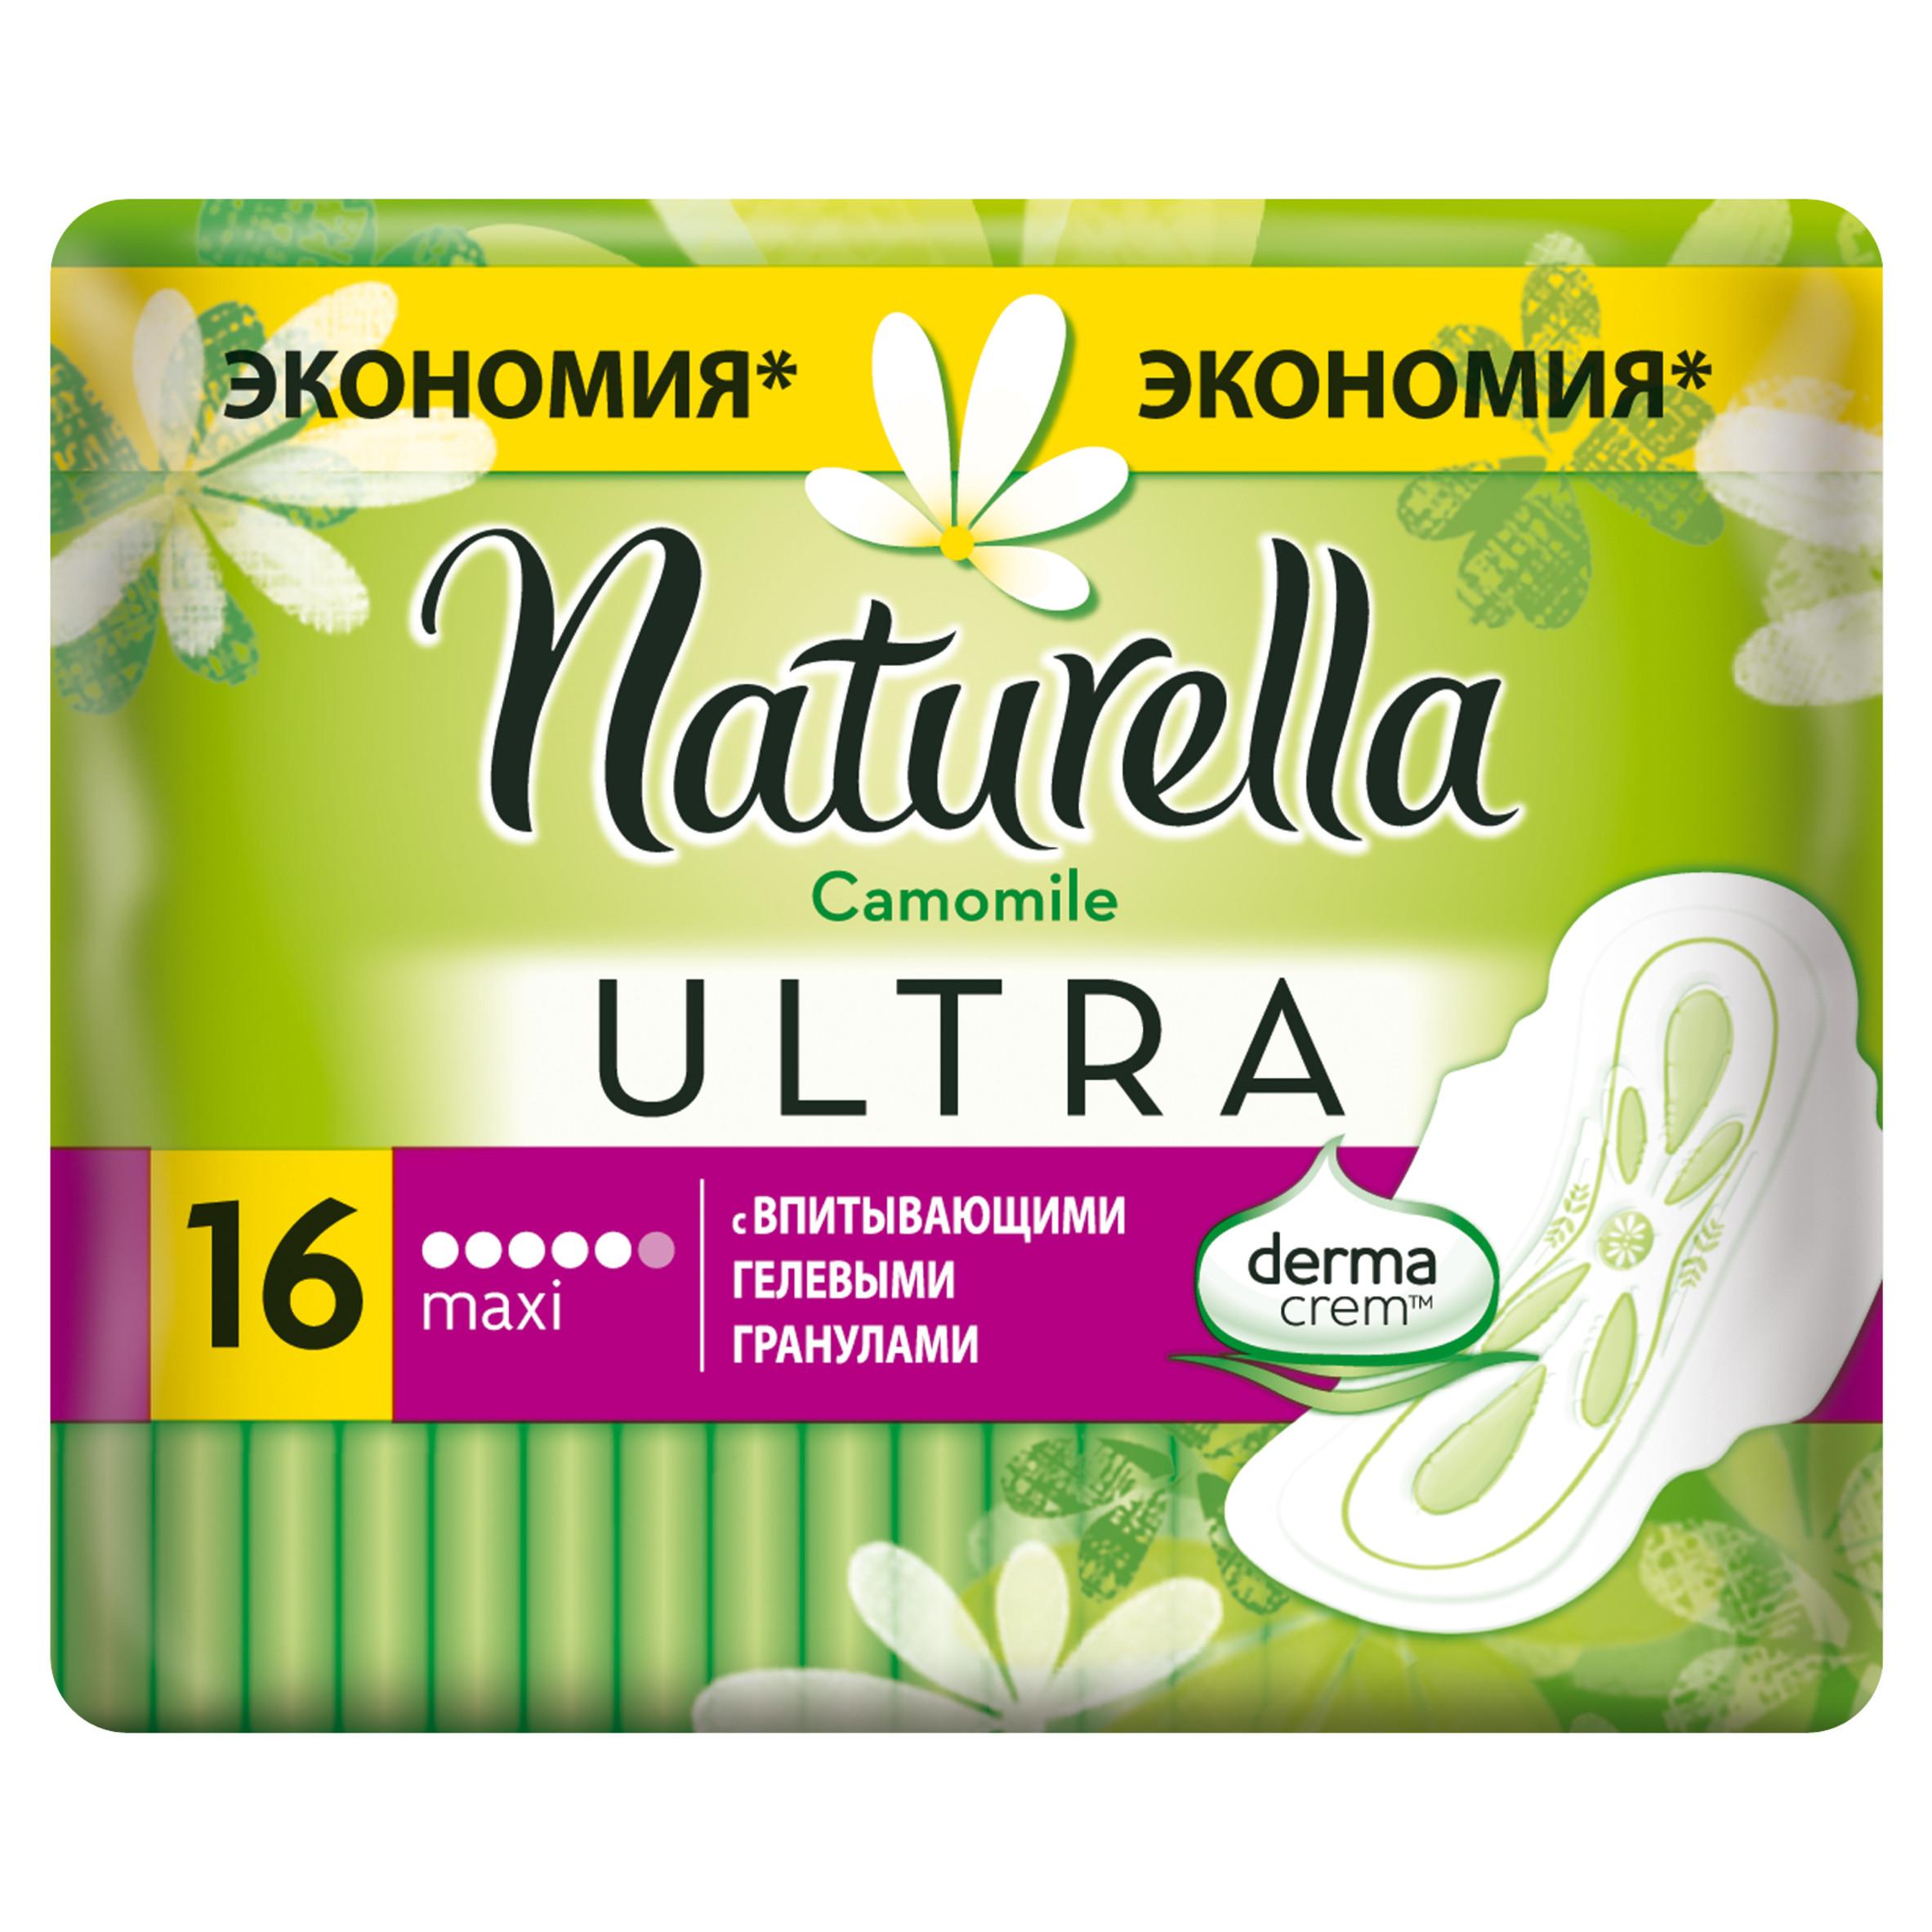 Прокладки гигиенические Naturella Ultra Maxi Camomile 16Шт.<br>